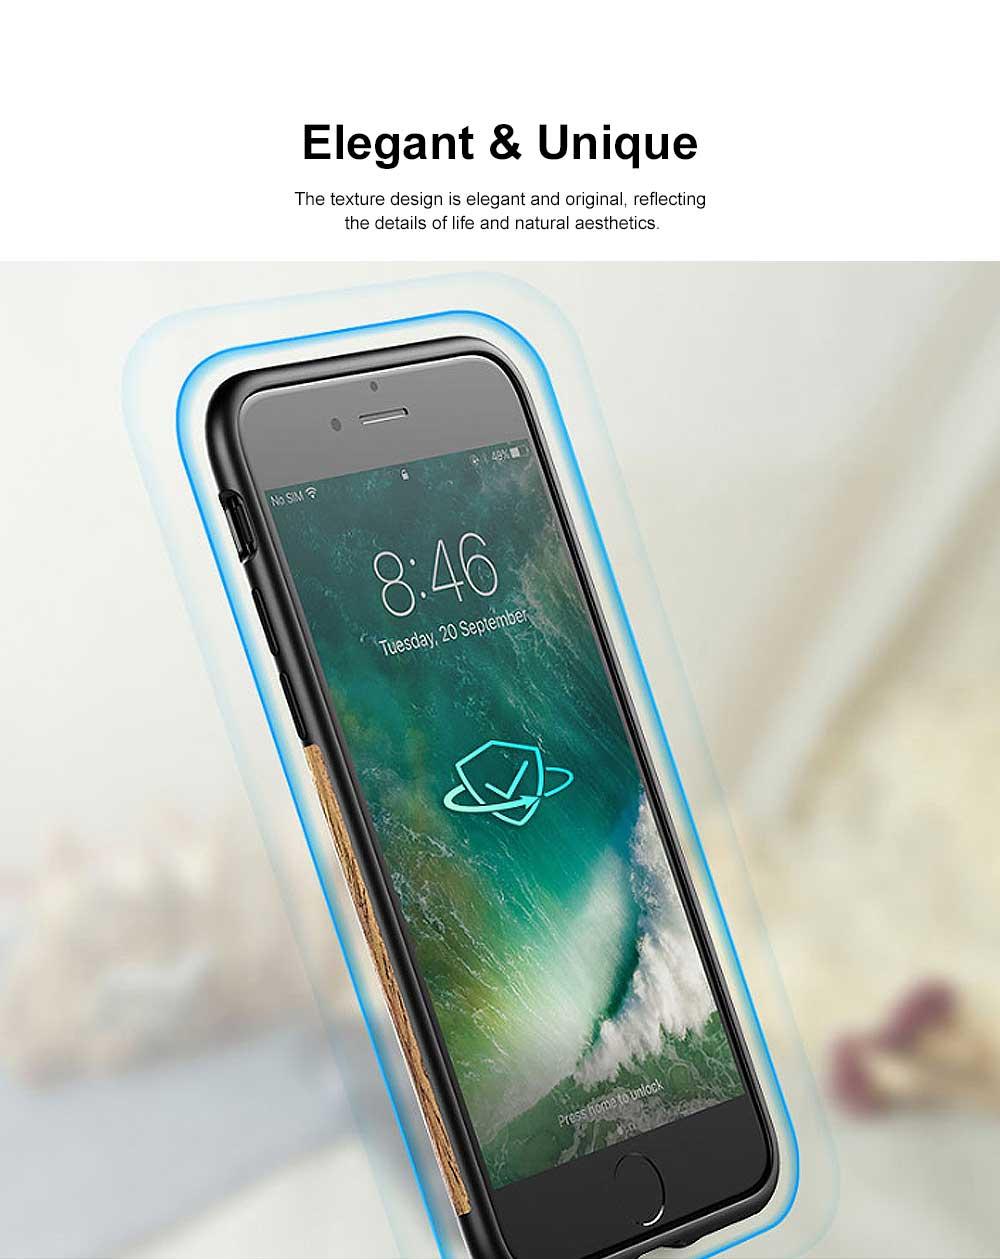 Silicone Anti-fall Phone Case, Fashion Original Phone Case, Wood-made Phone Case for iPhone XS Max, X, XS, 7 Plus, 8 Plus, 7, 8, 6, 6s, XR 2